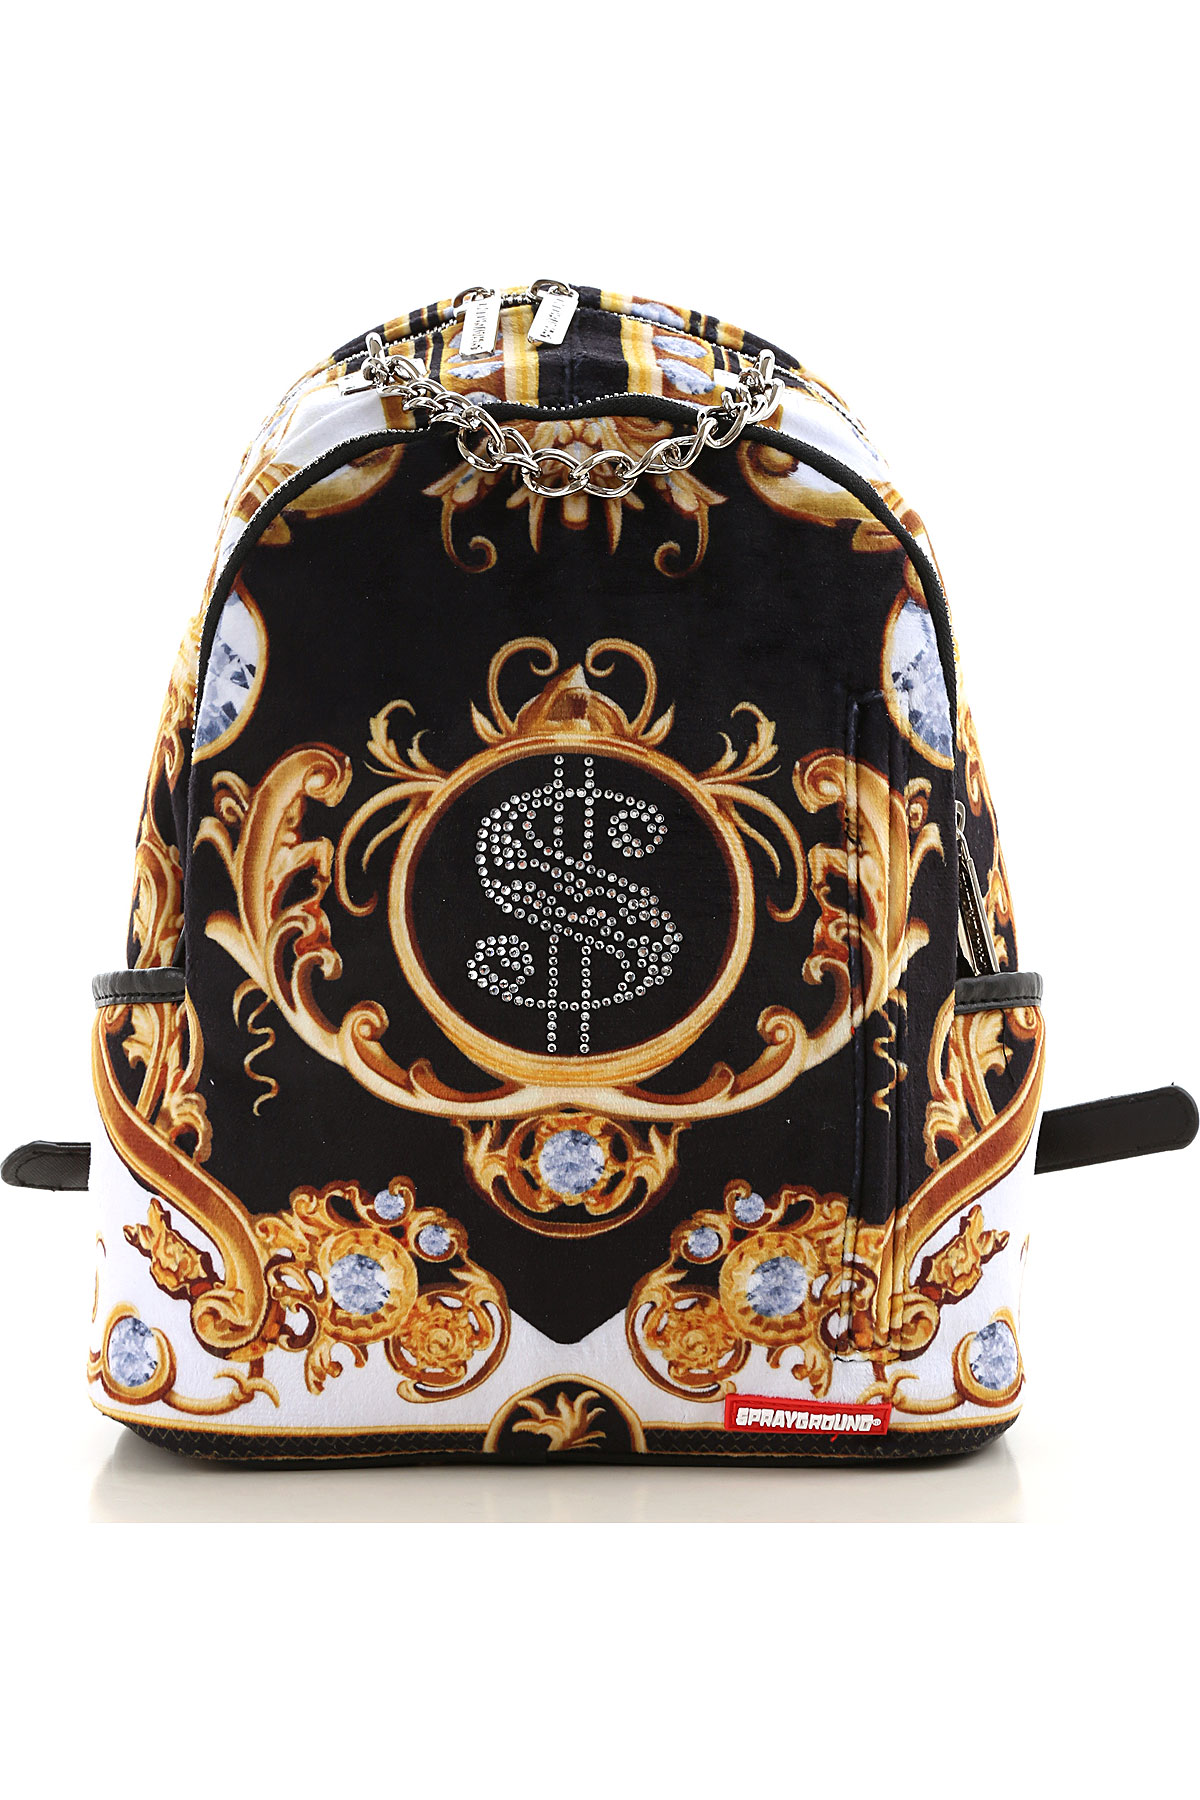 Sprayground Backpack for Men On Sale, Black, polyurethane, 2019